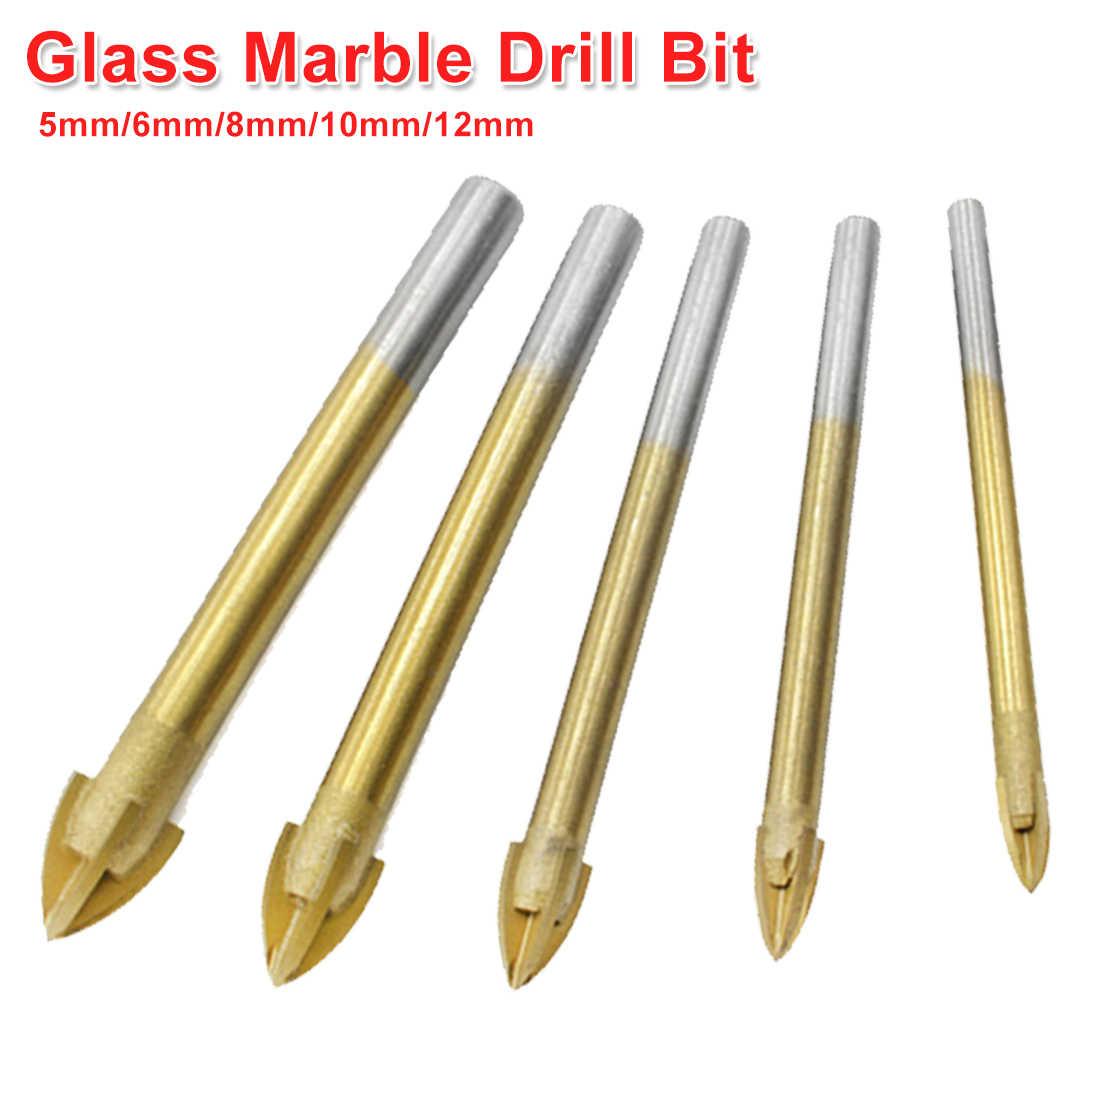 10Pcs//set Porcelain Spear Head Tile Glass Ceramic Marble Drill Bits Hex-Shank